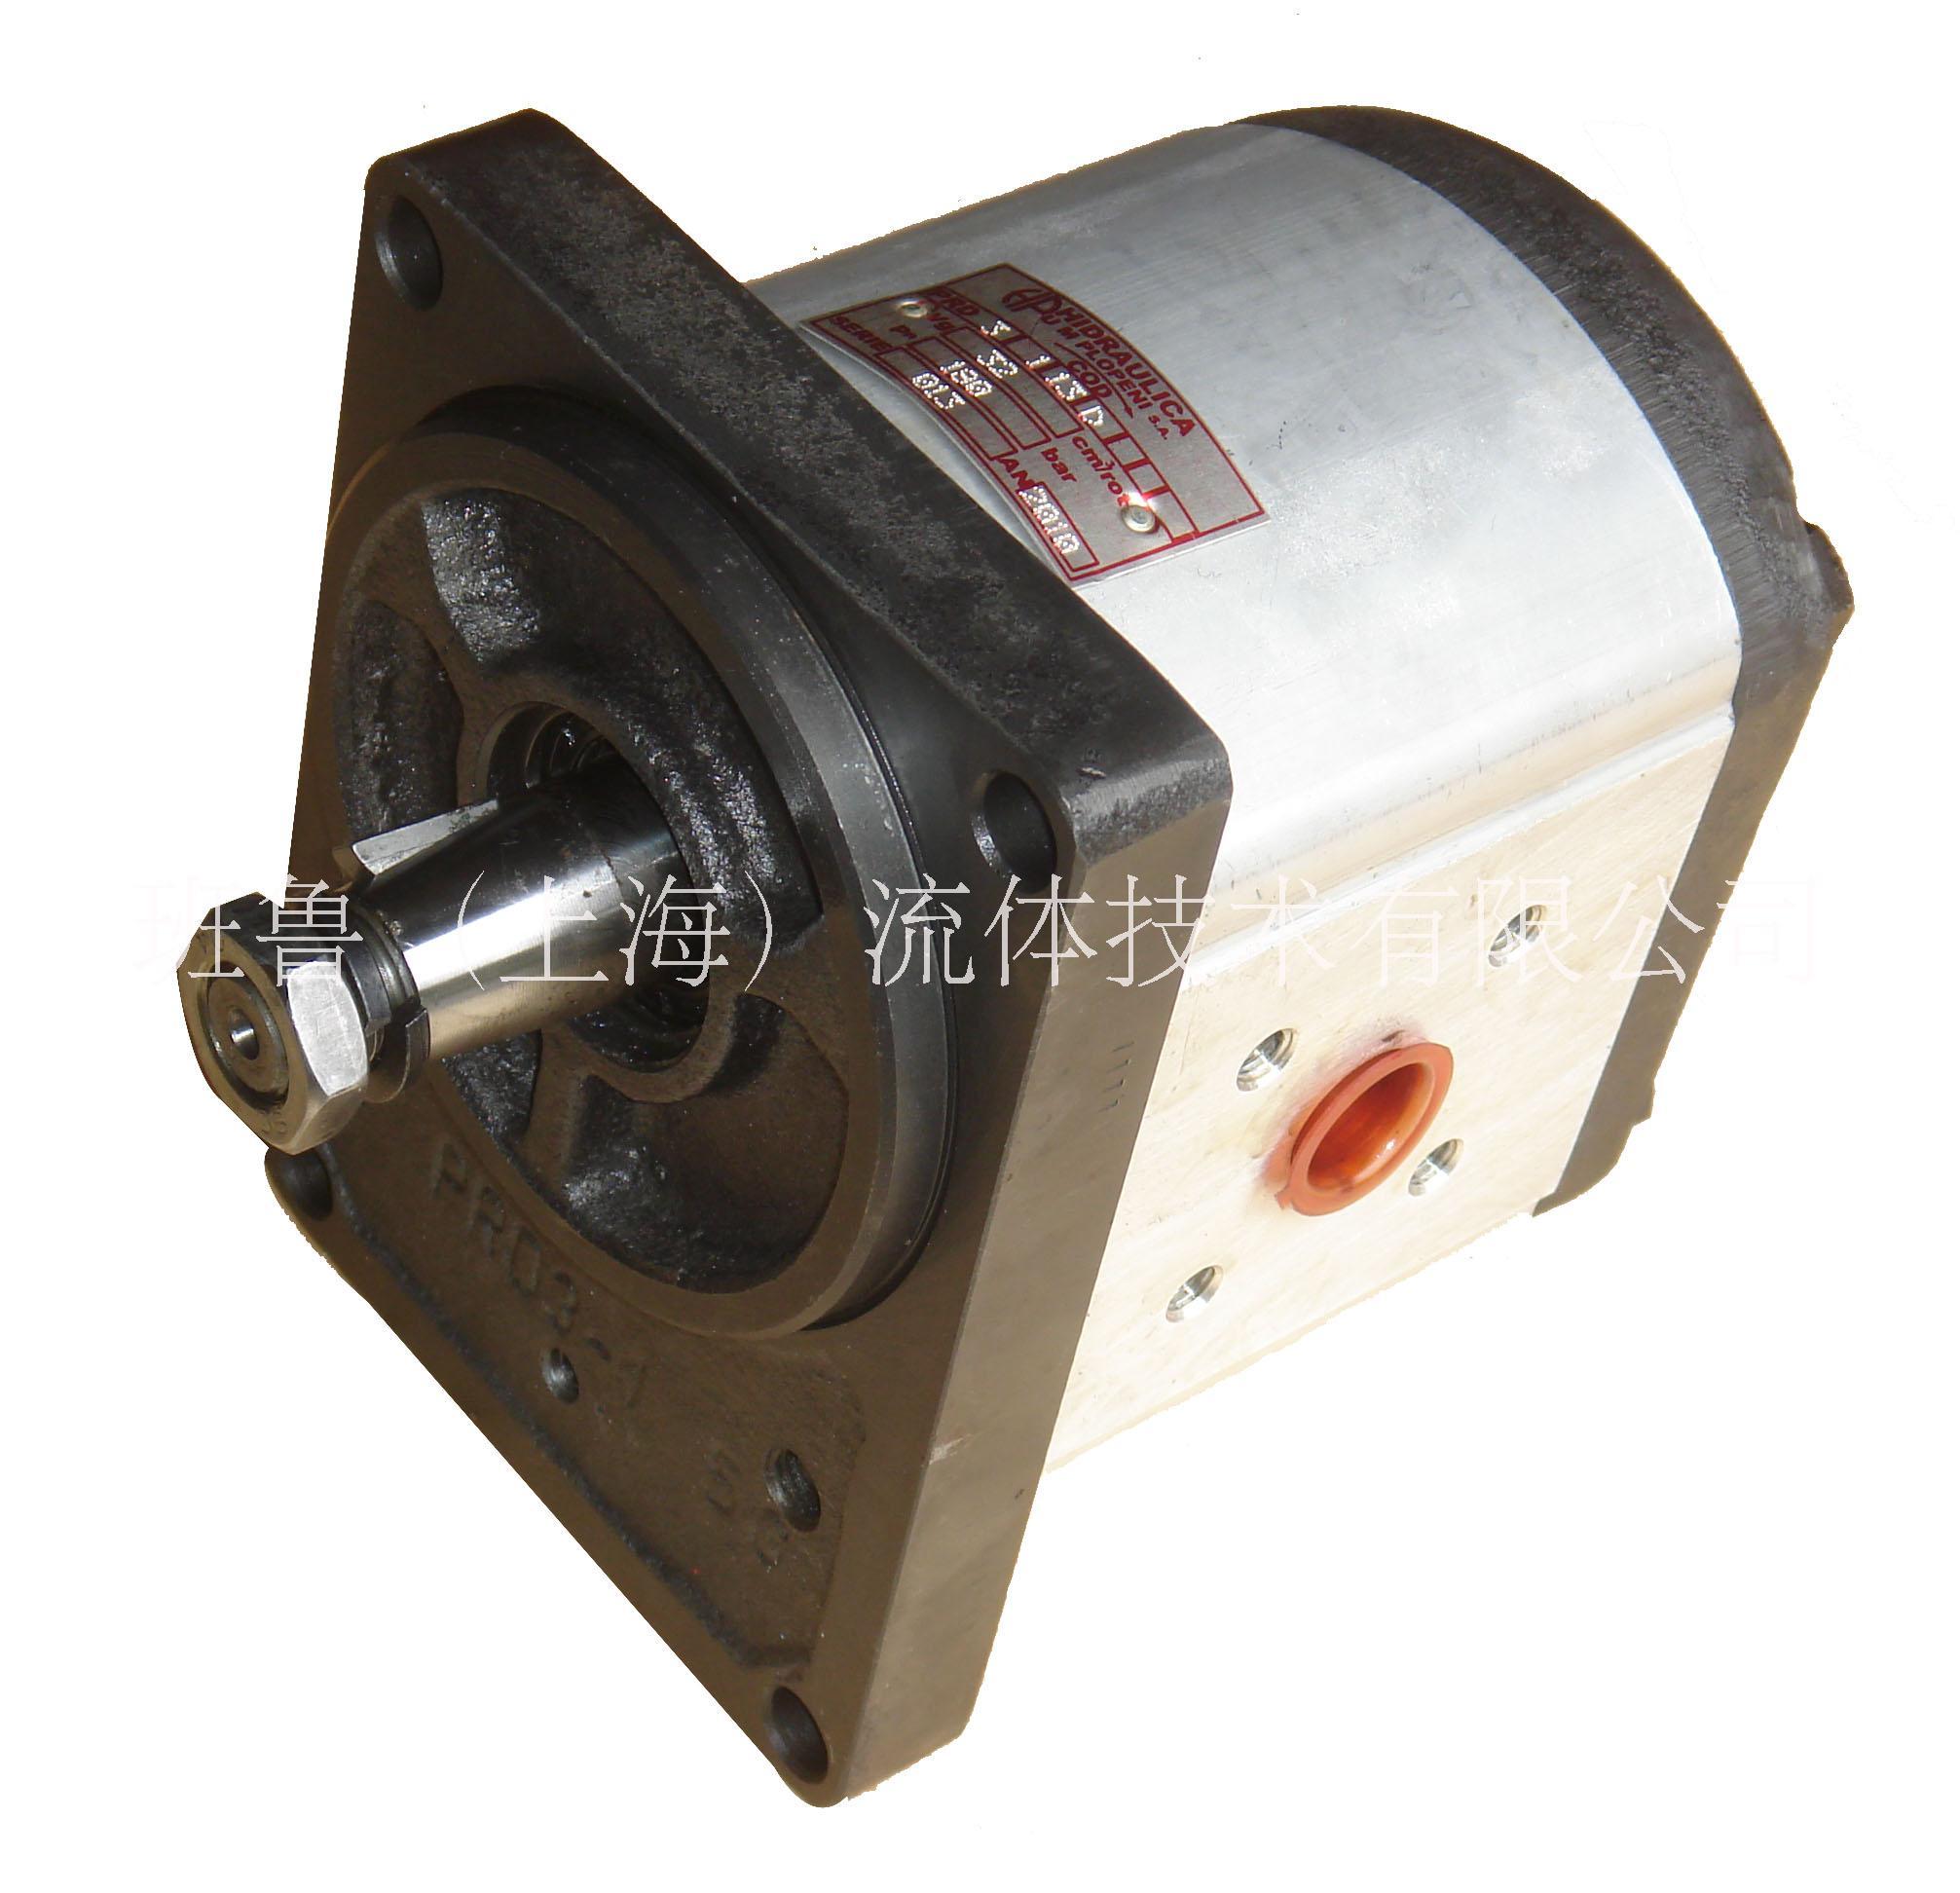 齿轮泵 PRD2-114D 齿轮泵 PRD2-114D  齿轮泵 PRD2-114D 05